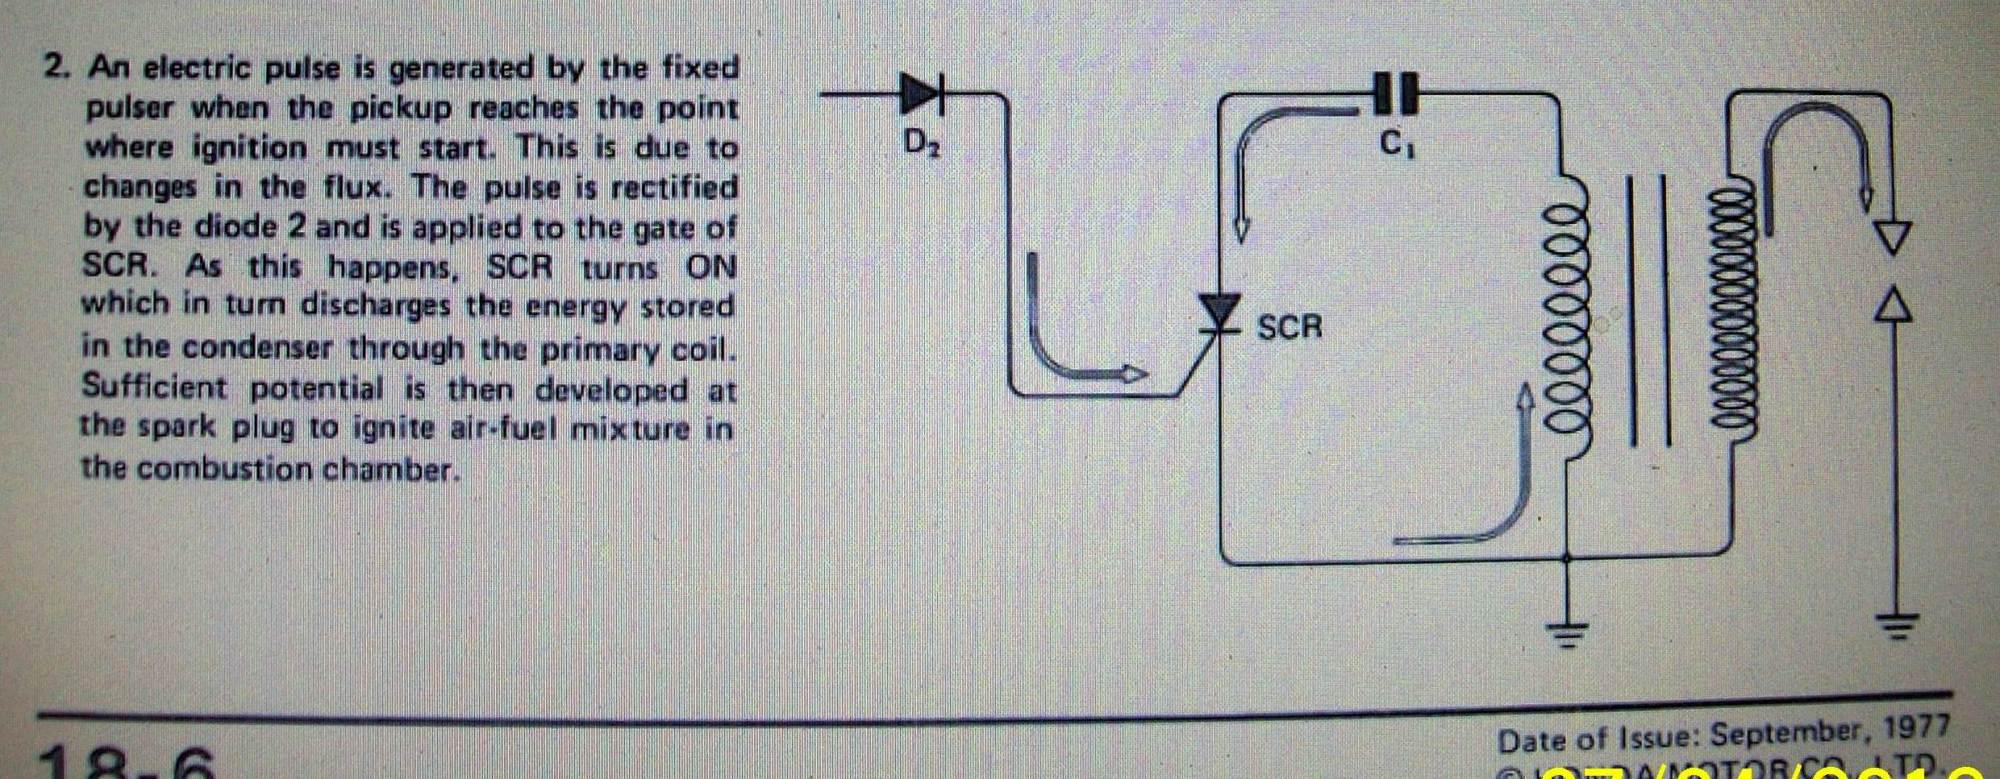 hight resolution of cb400 wiring diagram wiring diagram and schematics 1980 honda 400 hawk 1980 honda cb400t wiring diagram